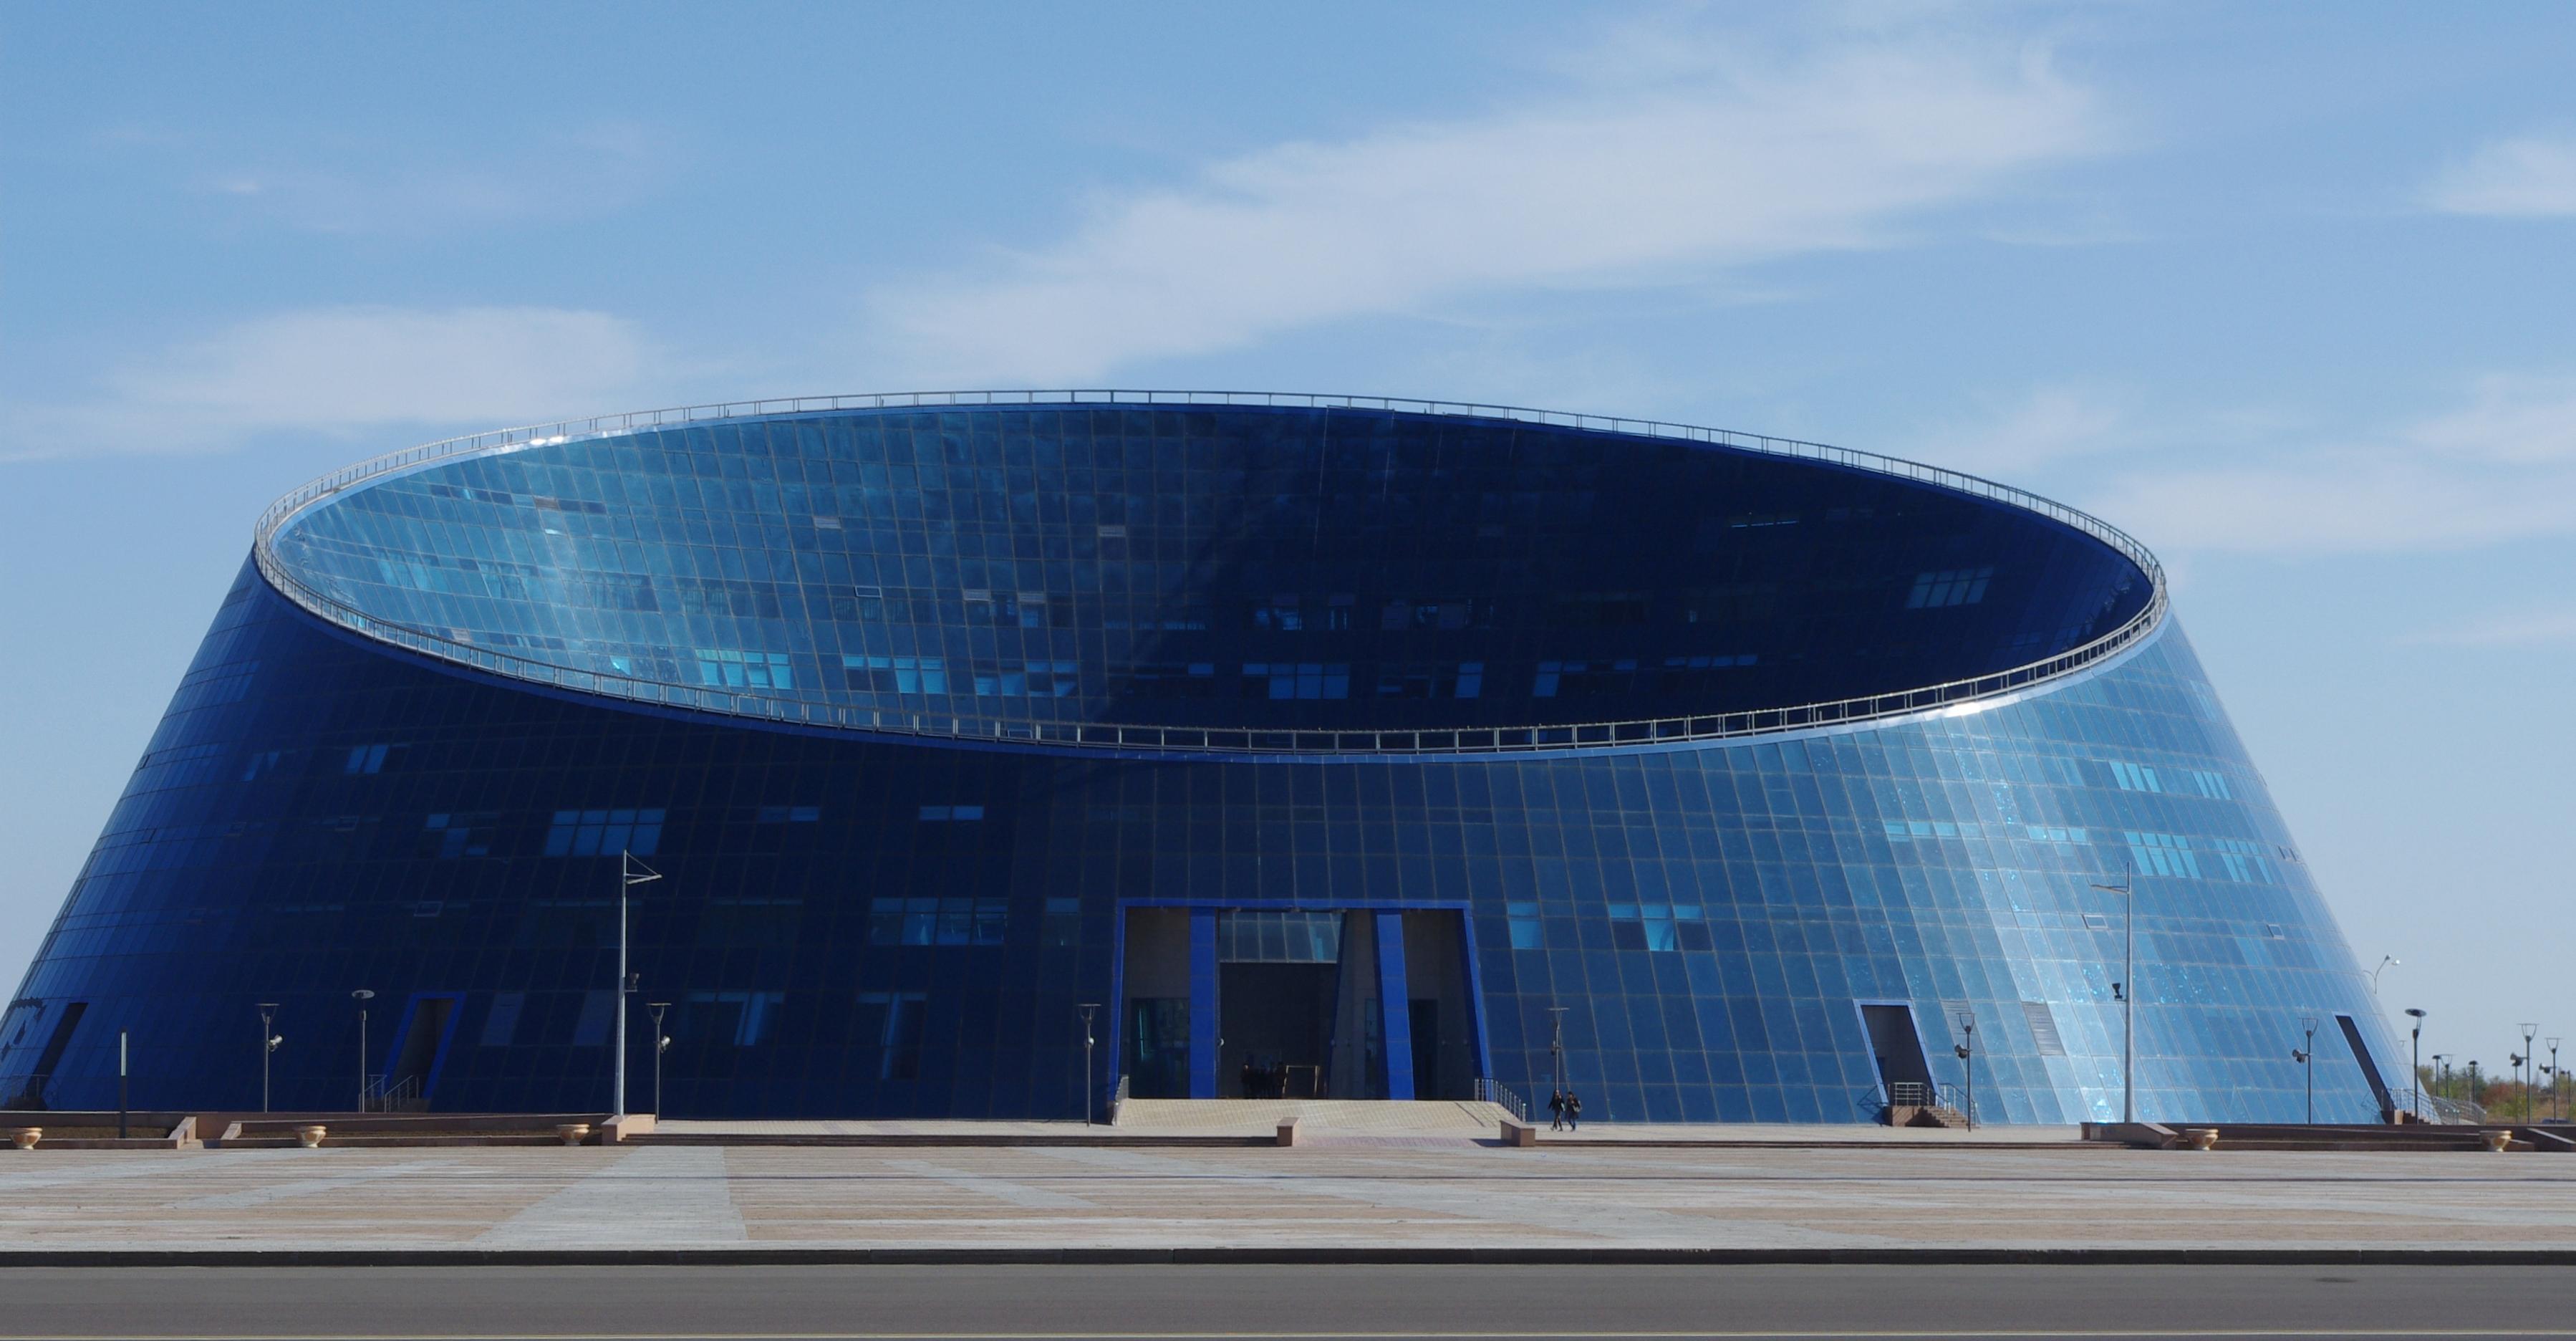 Kazakh National University of Arts, Astana, Kazakhstan [3597 x 1872]